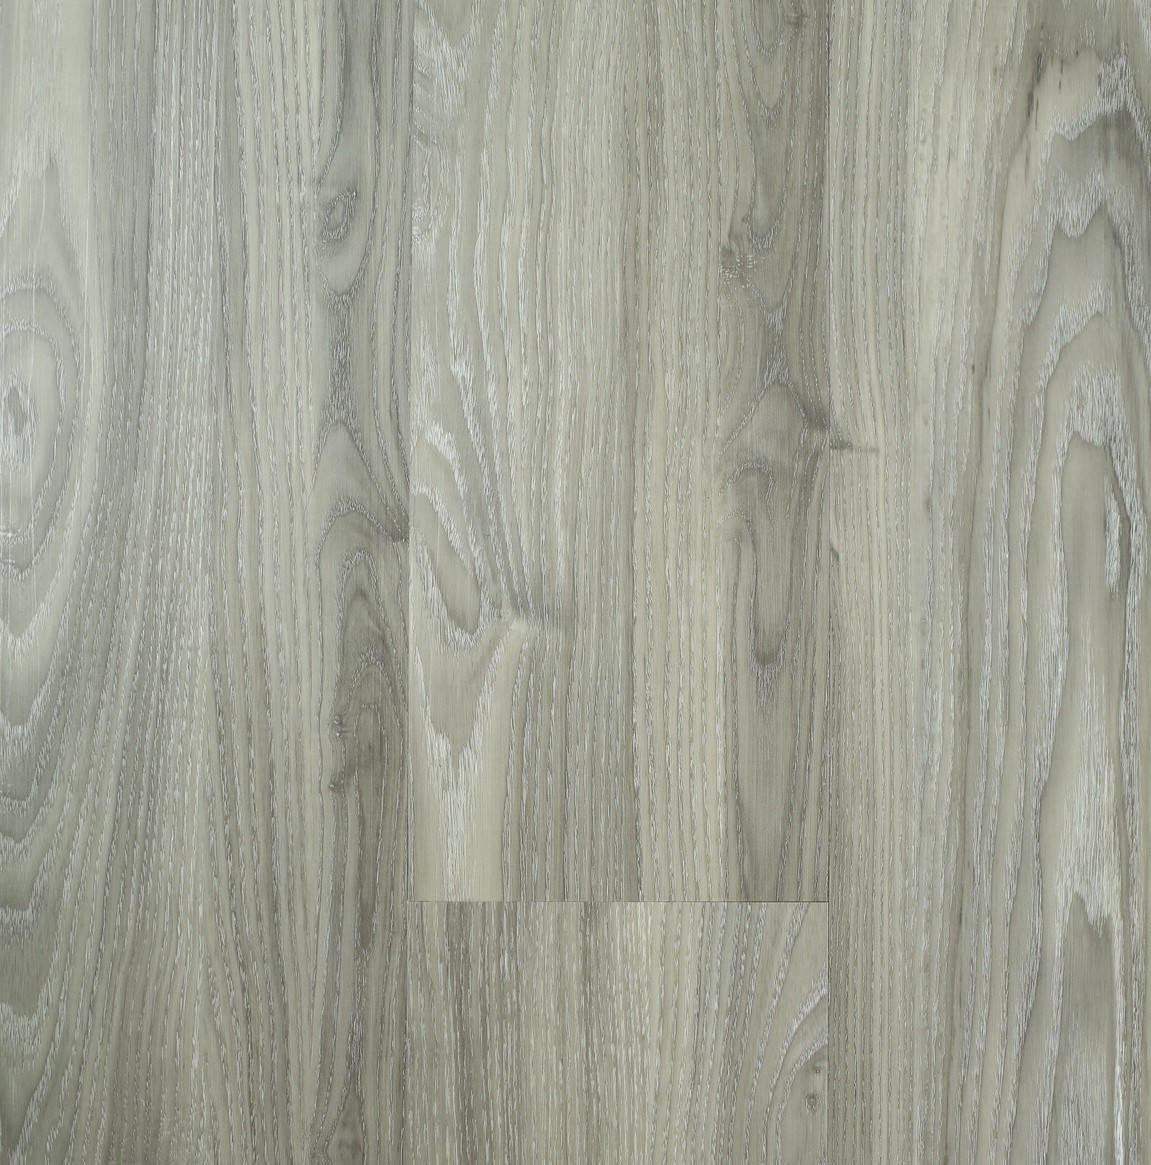 China Light Grey Wood Grain Vinyl Plank